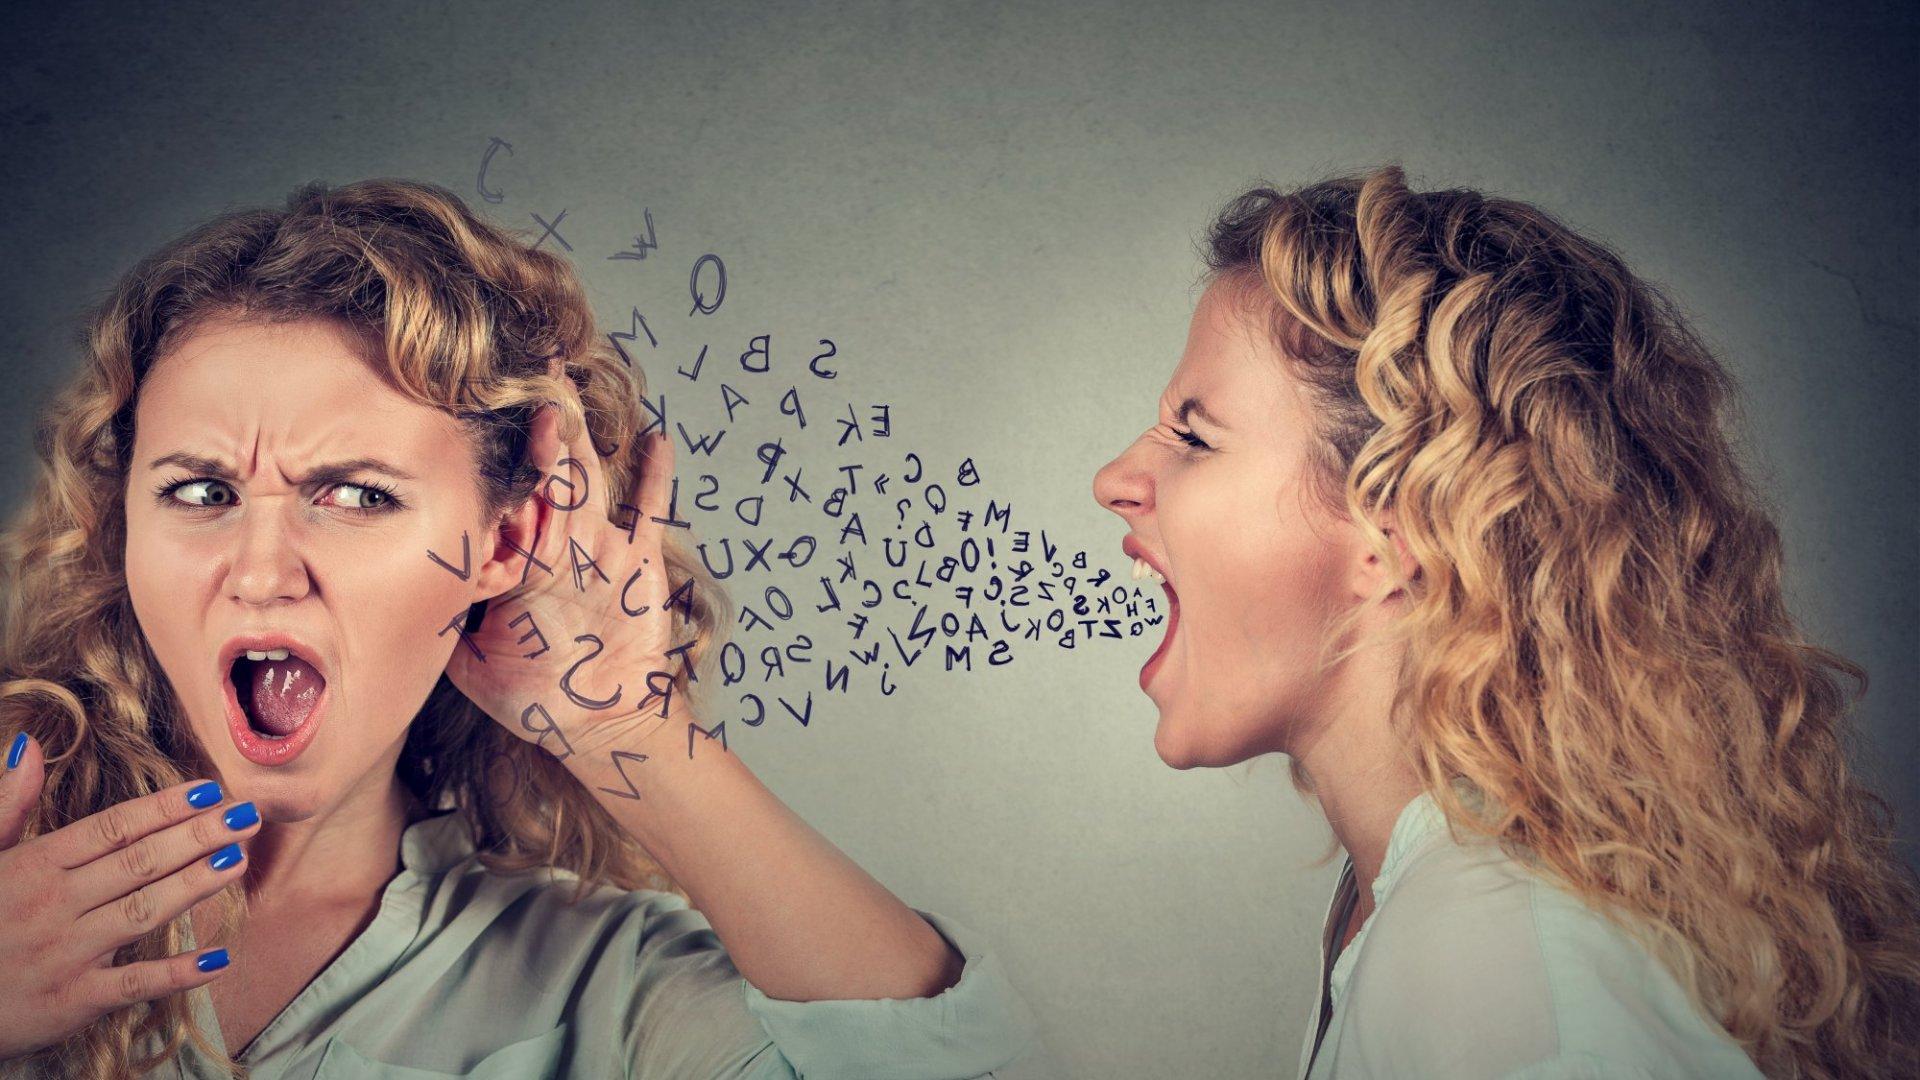 The #1 Thing Fake News Can Teach EntrepreneursAbout Marketing